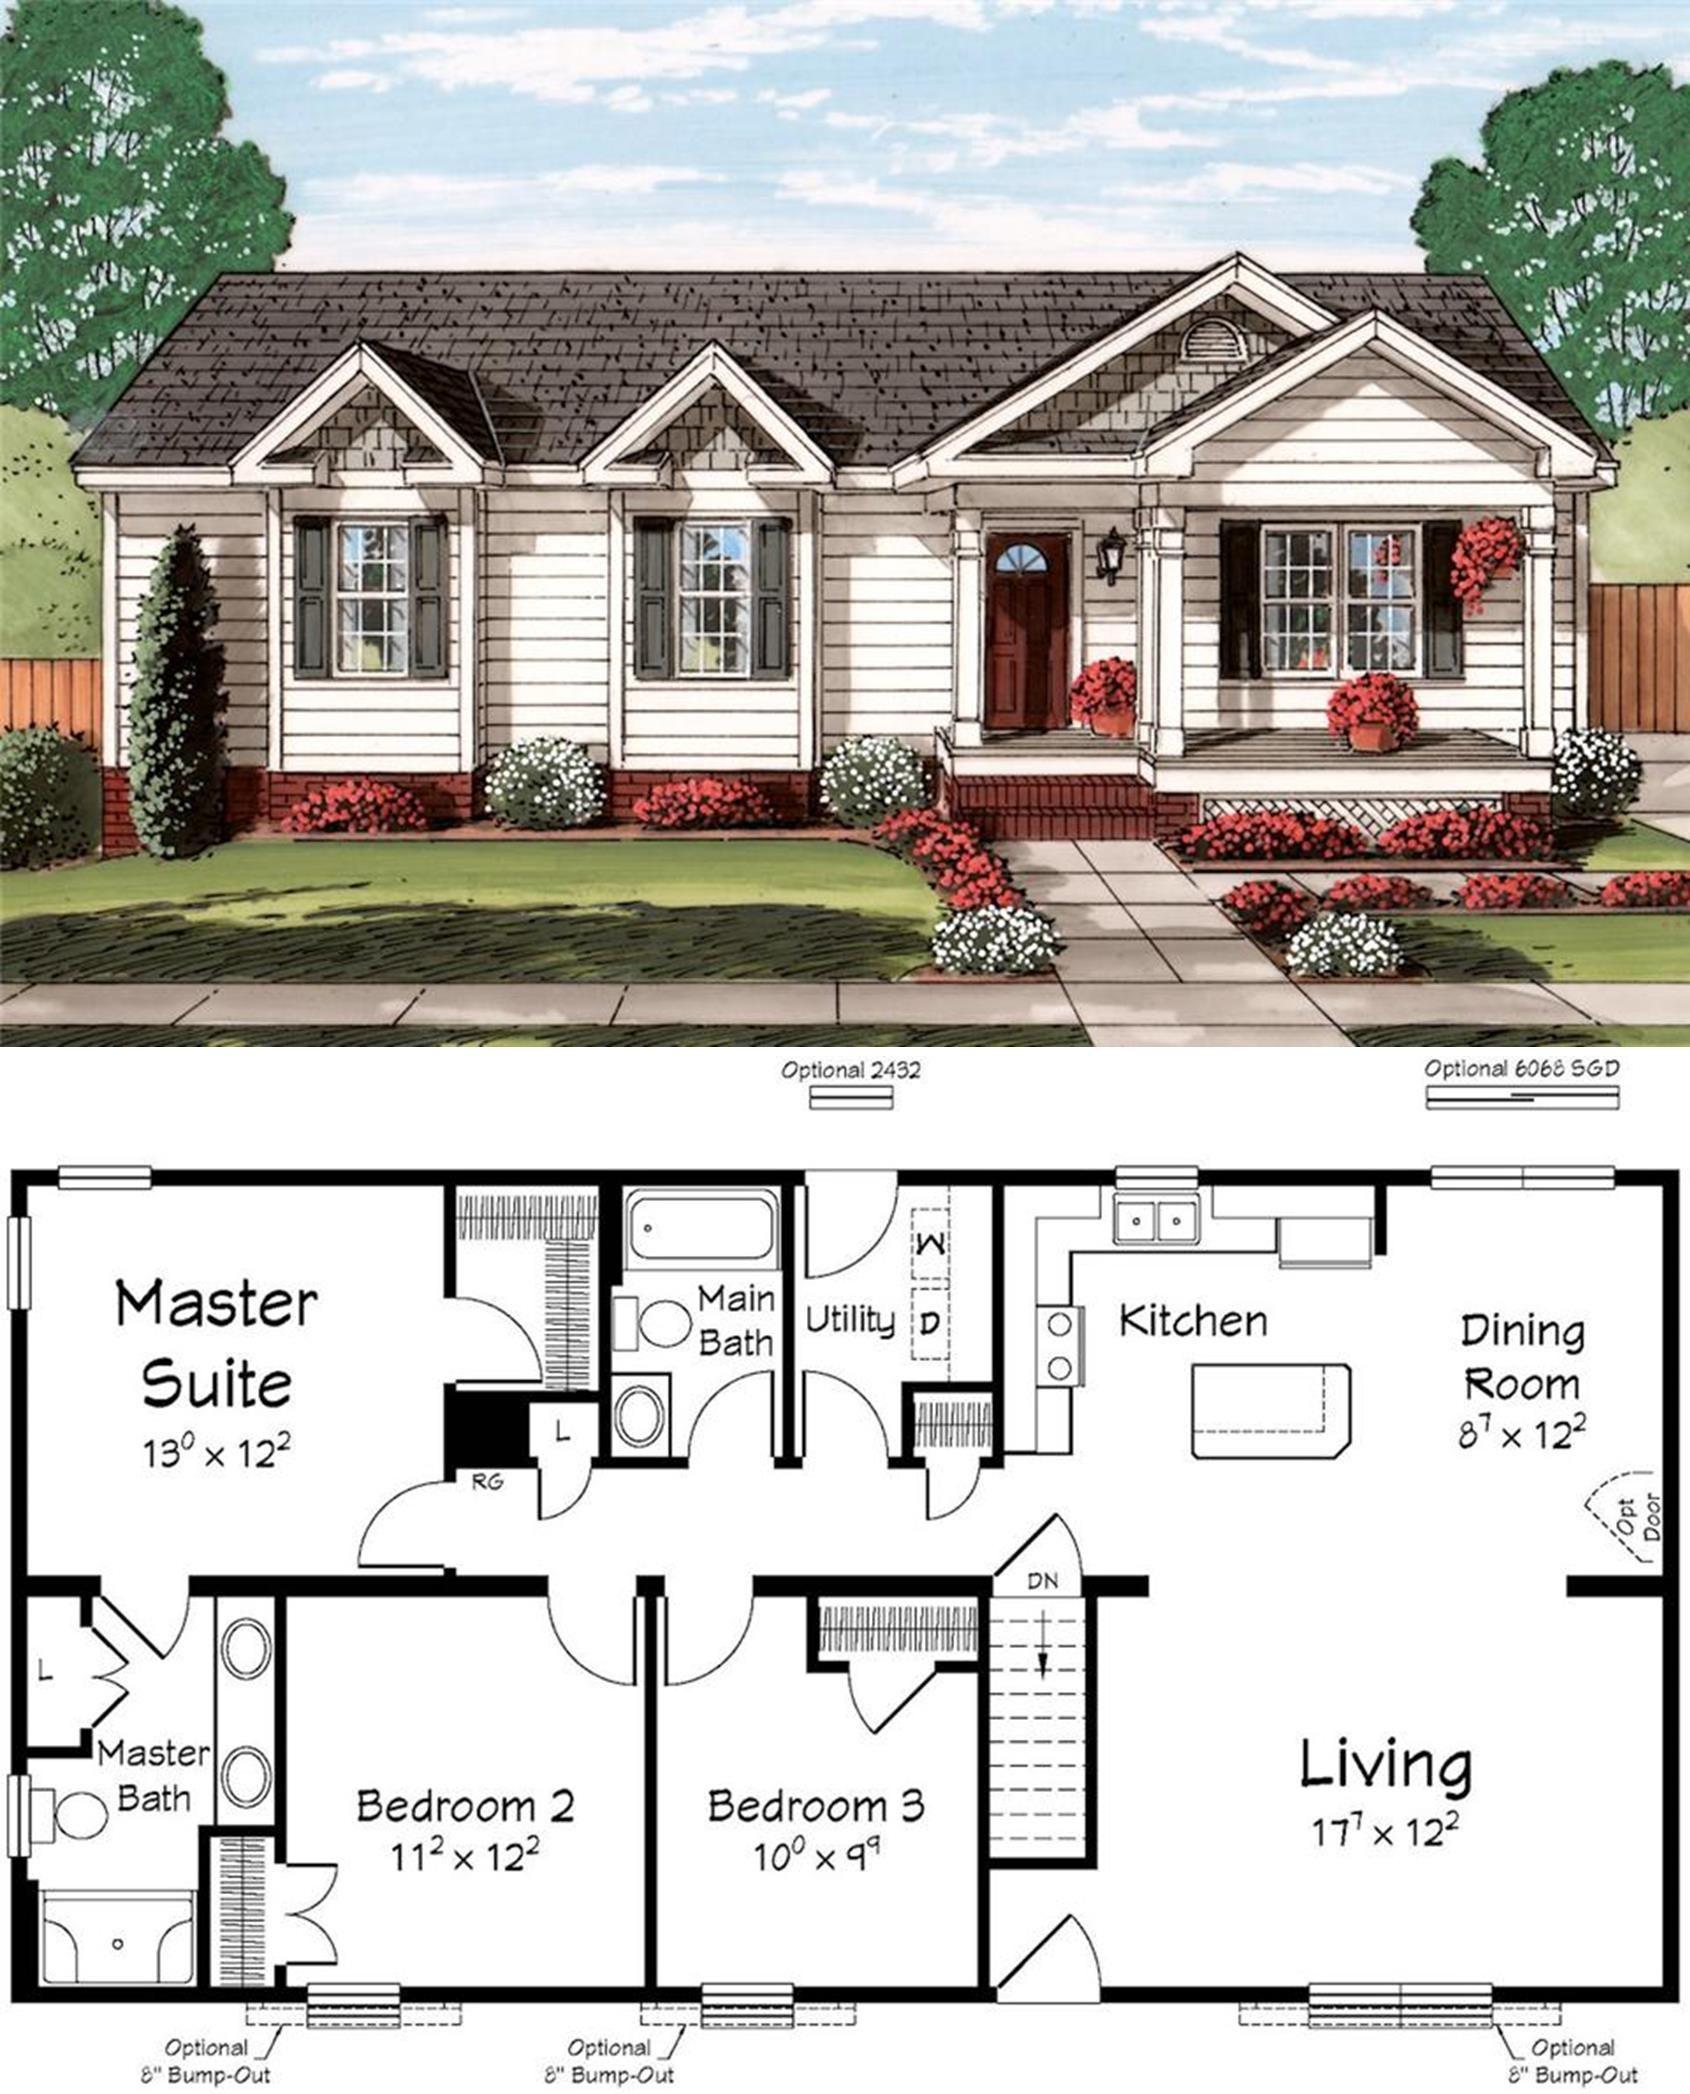 Ritz-Craft Custom Homes | Building Ideas | Pinterest | Craft, House ...